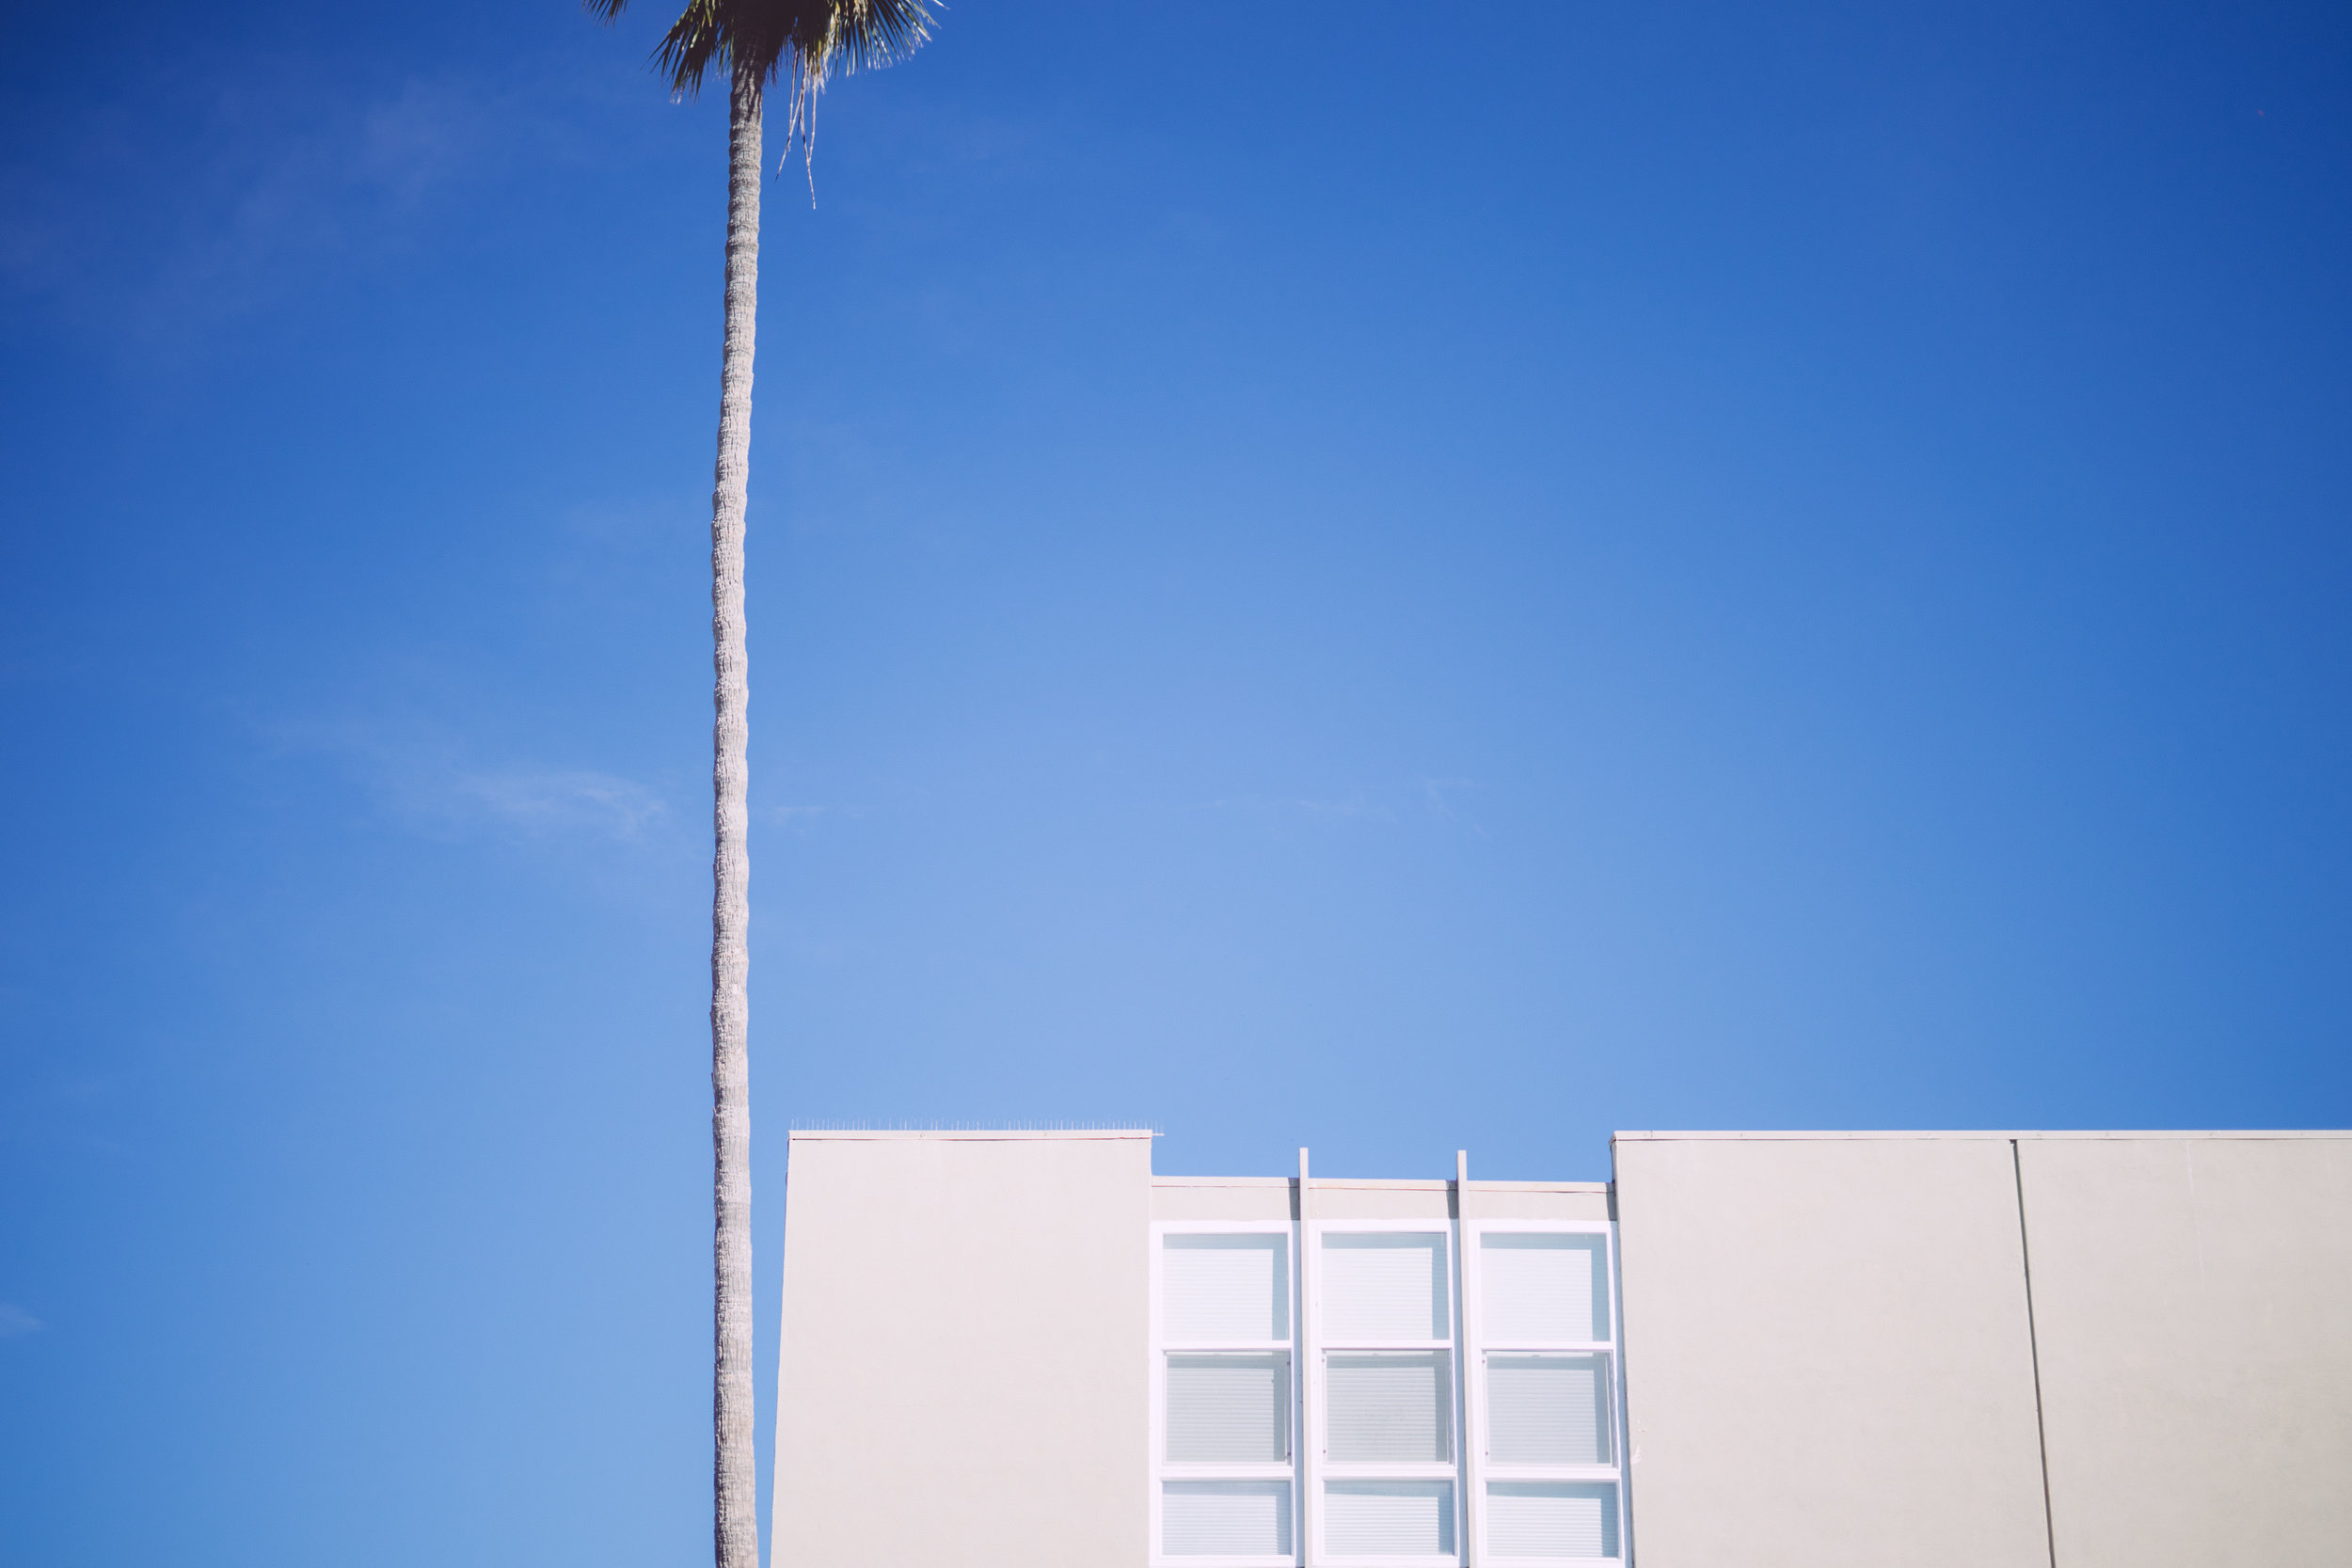 laguna beach-630.jpg